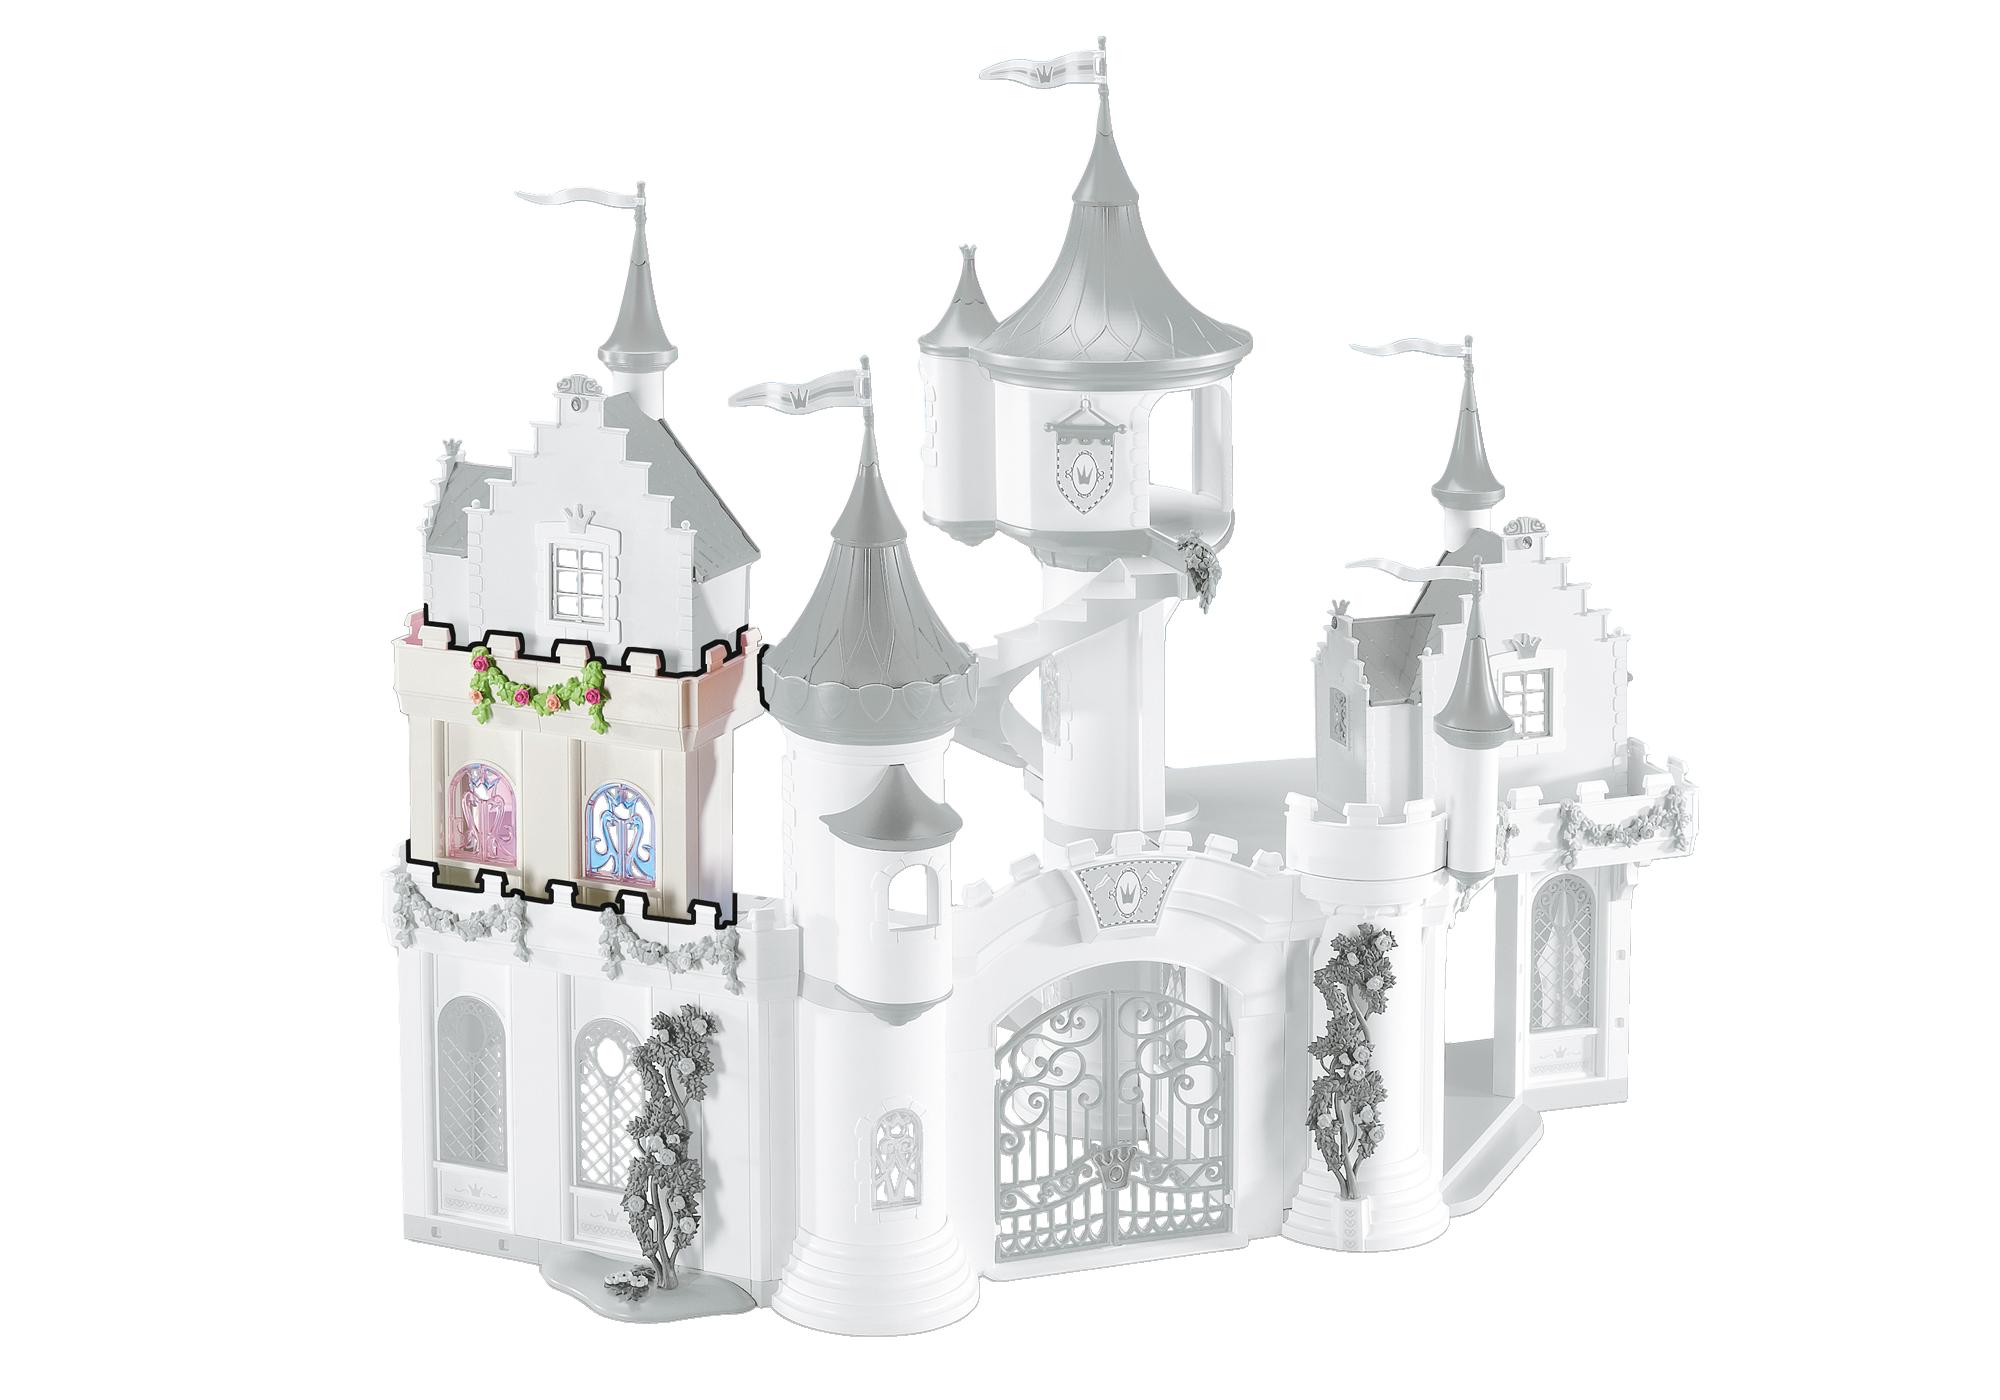 http://media.playmobil.com/i/playmobil/6518_product_detail/Prinsesseslot udvidelse A